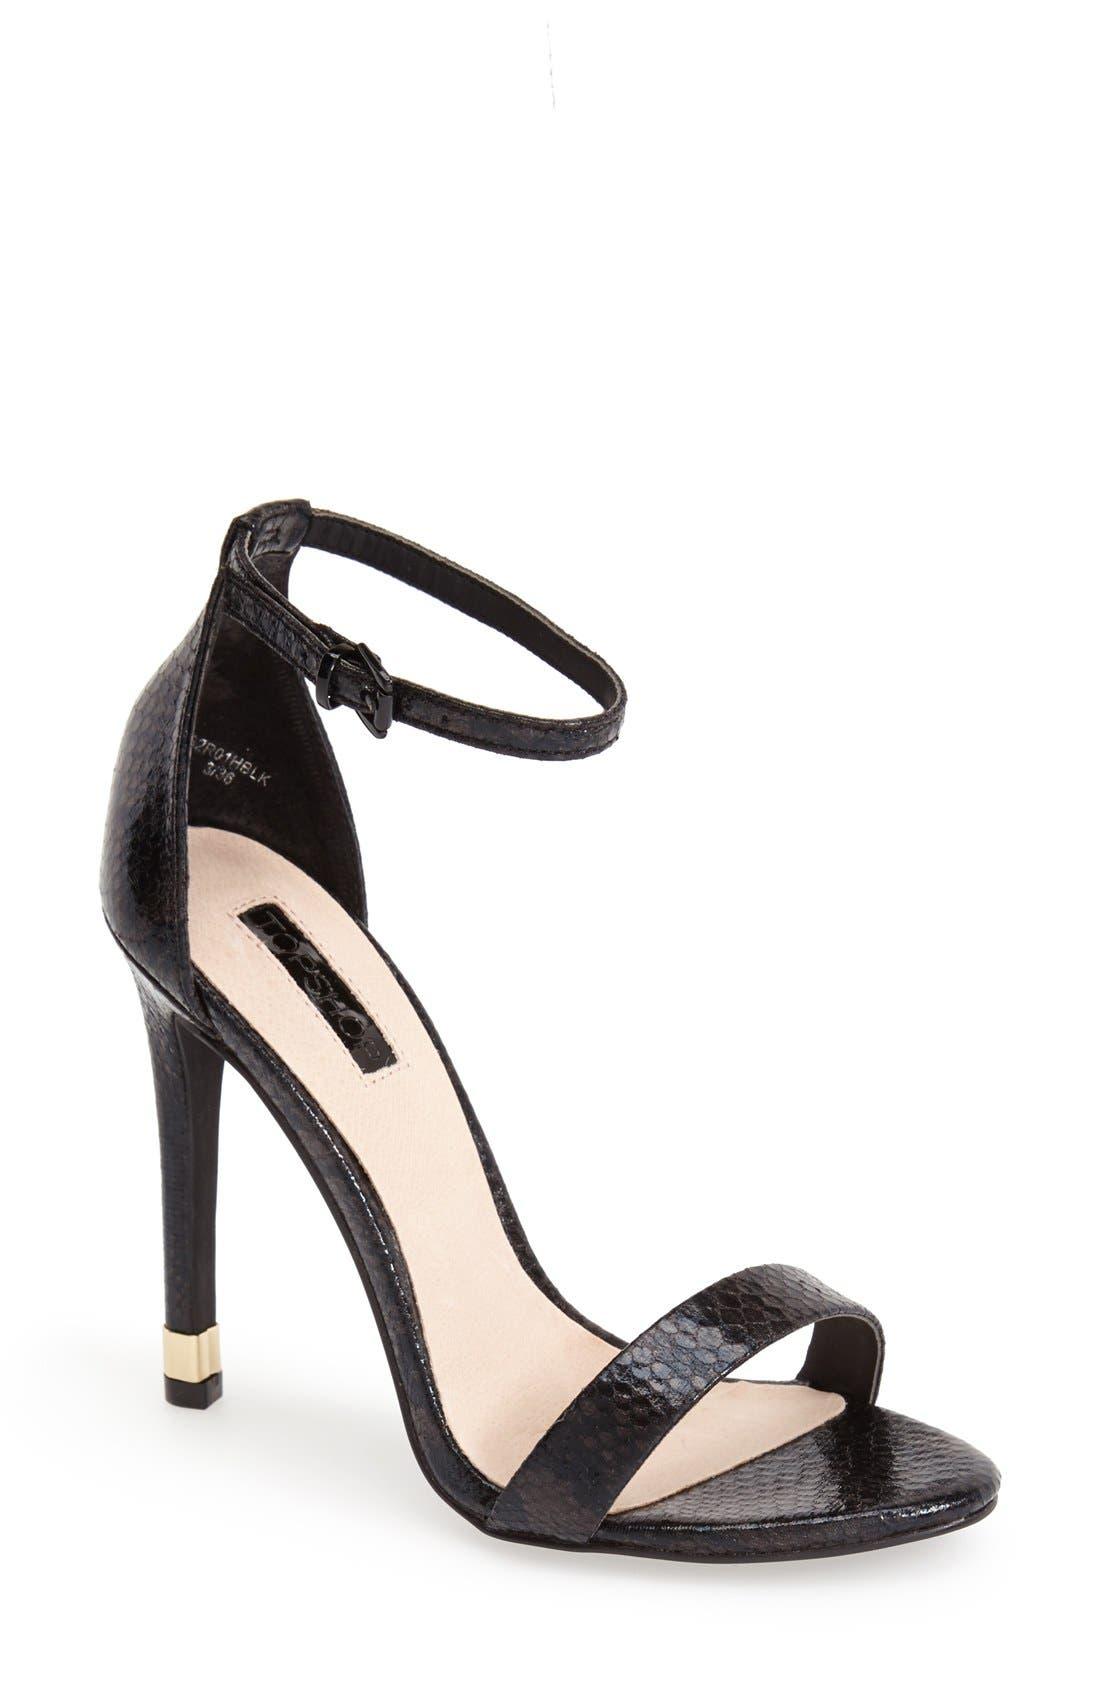 Main Image - Topshop 'Ruby' Snake Embossed Ankle Strap Sandal (Women)